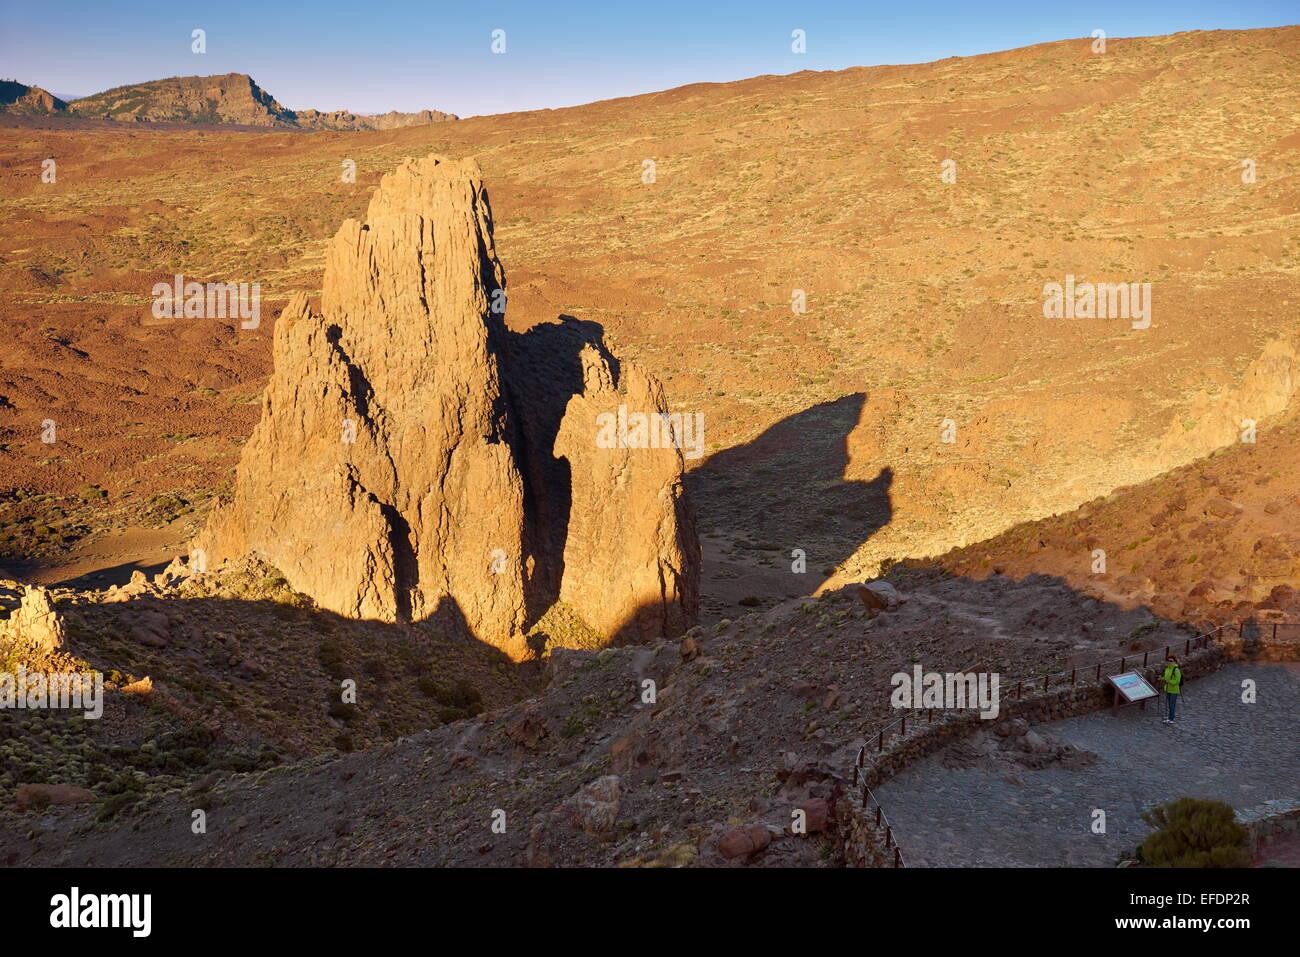 Felsformation im Teide-Nationalpark, Teneriffa, Kanarische Inseln, Spanien Stockbild